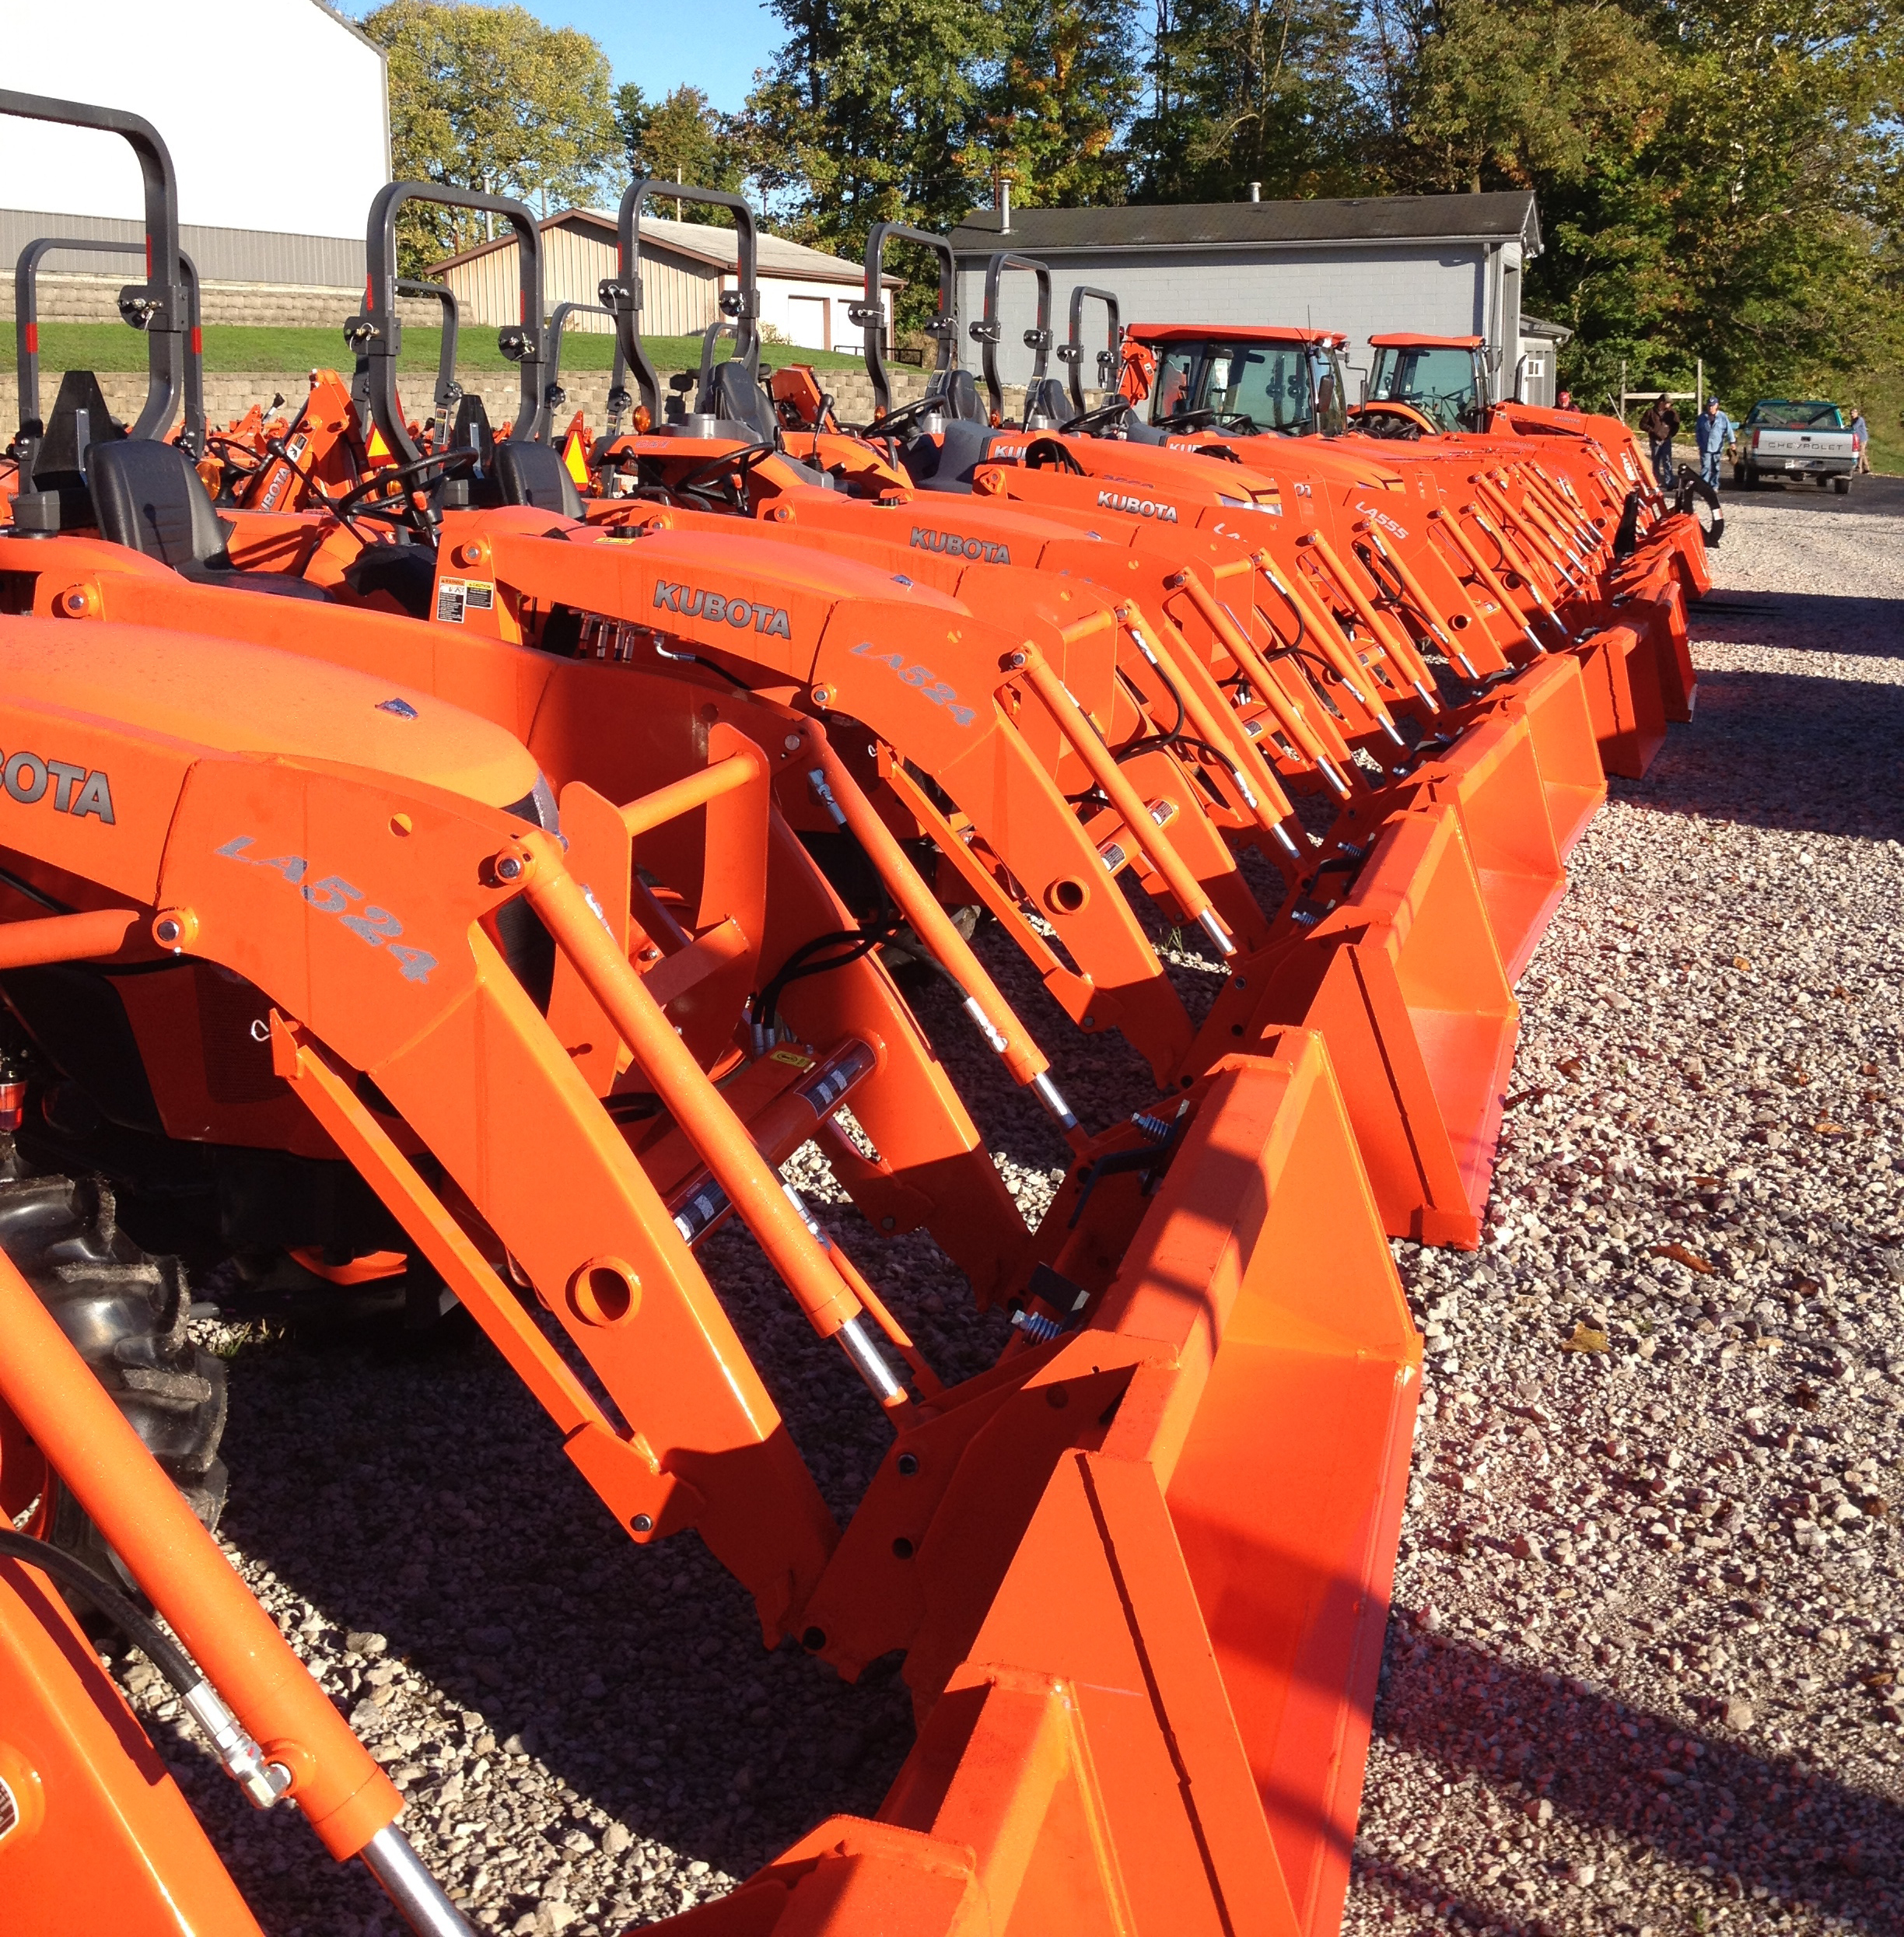 Humphreys' Outdoor Power's row of new Kubota Tractors